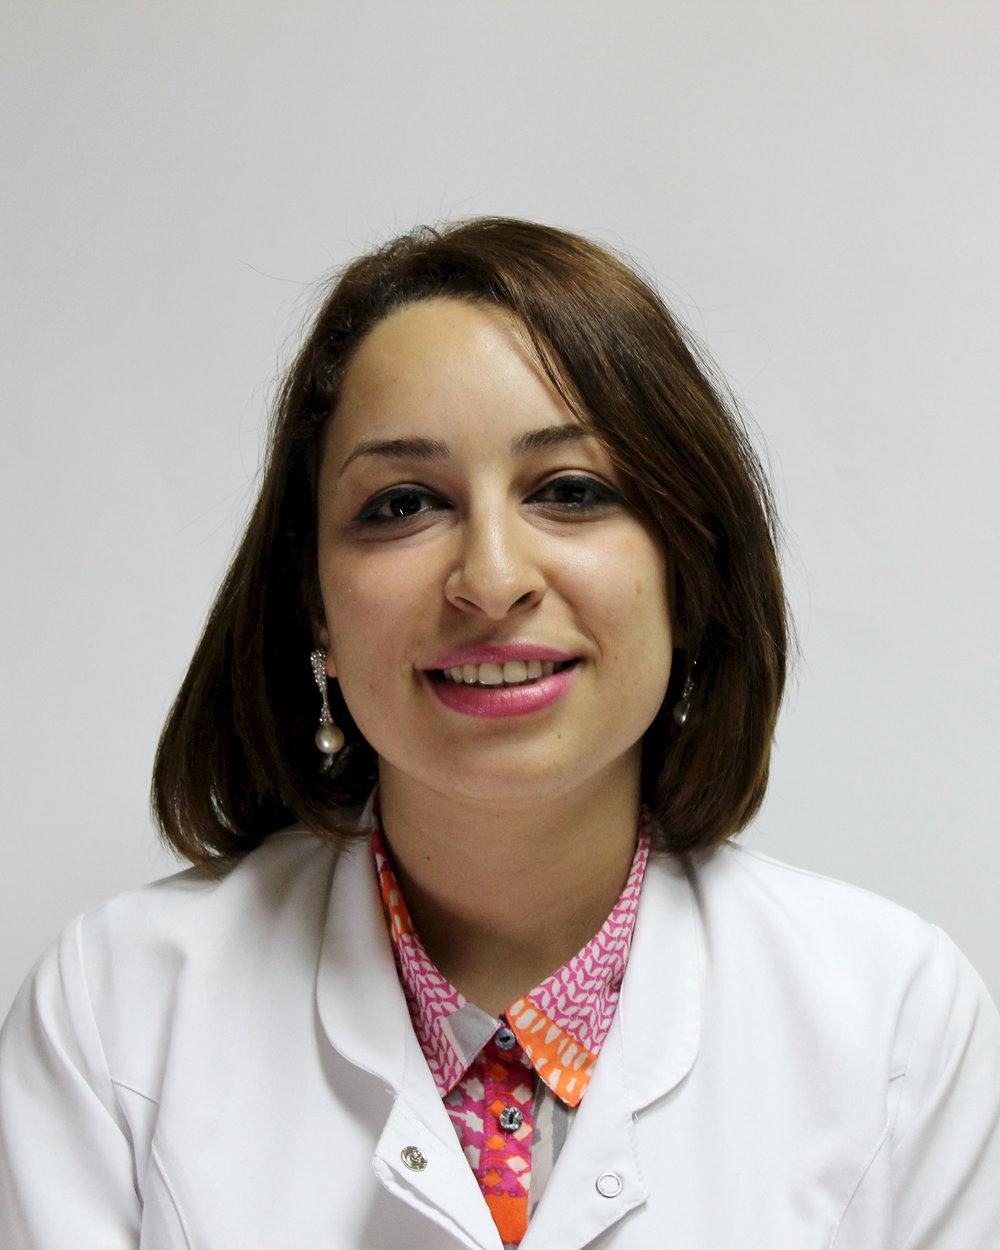 Dr. Ola Fattah Clinical Pharmacy Manager